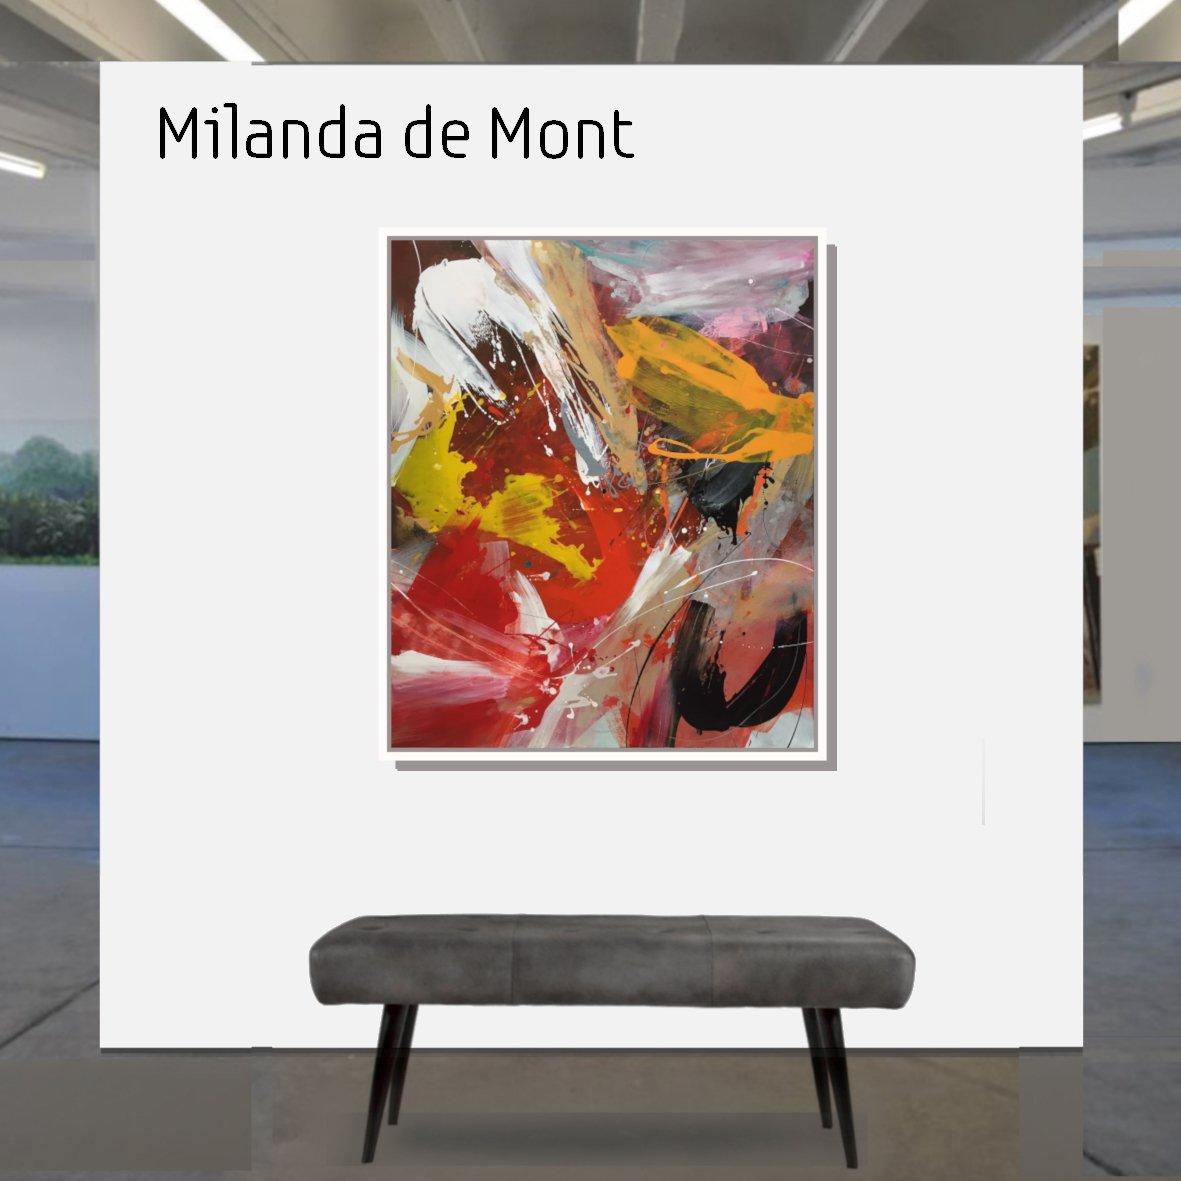 Makse_2020 Milanda de Mont Freiraum_mit_Rahmen